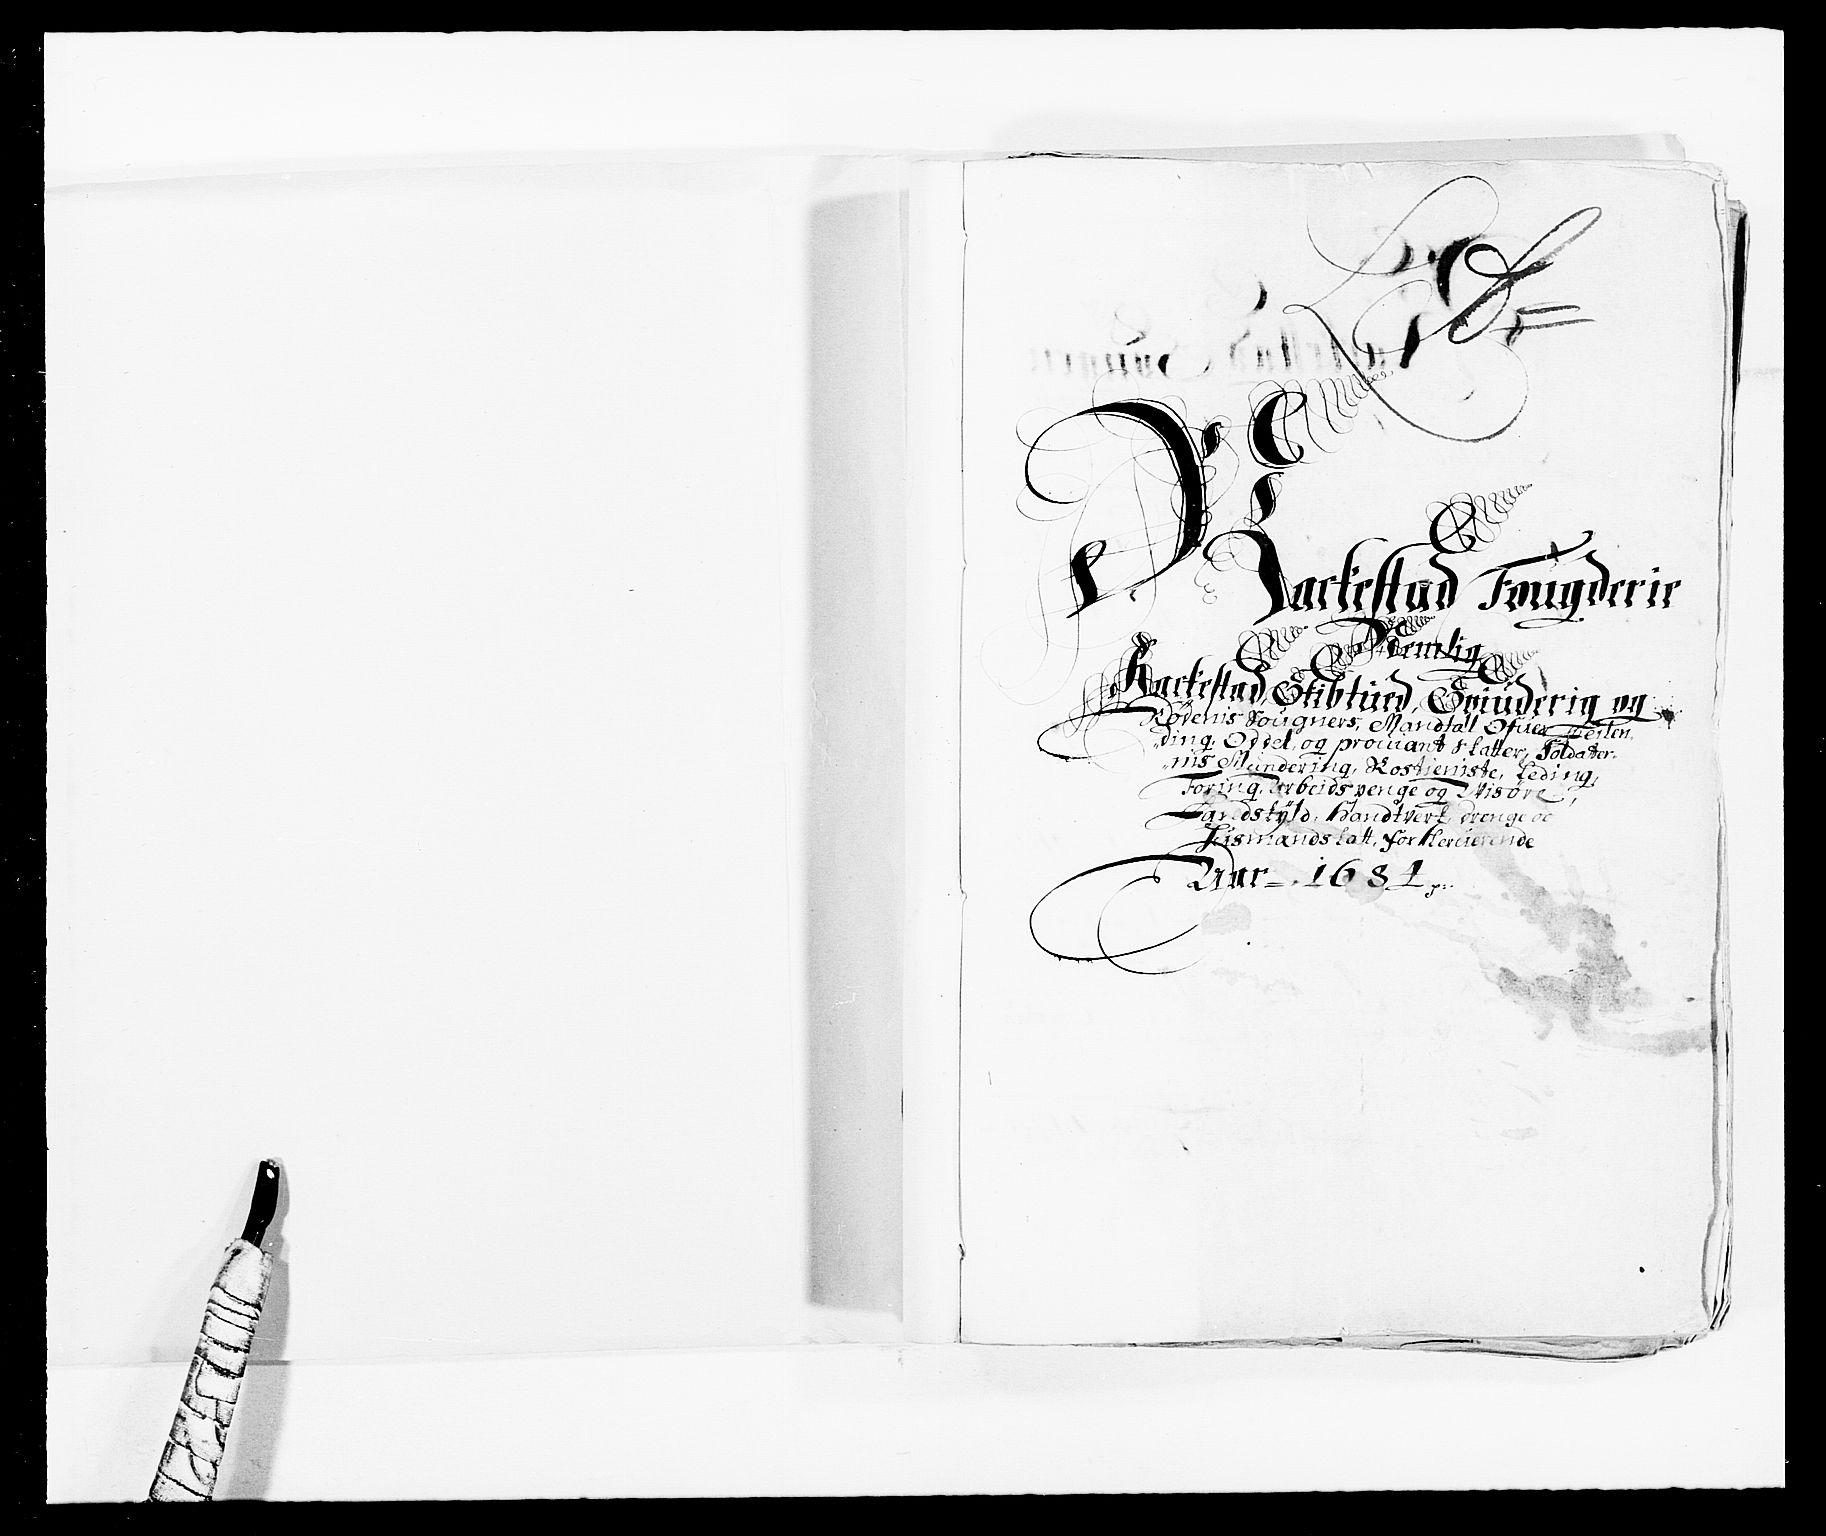 RA, Rentekammeret inntil 1814, Reviderte regnskaper, Fogderegnskap, R05/L0274: Fogderegnskap Rakkestad, 1683-1684, s. 232